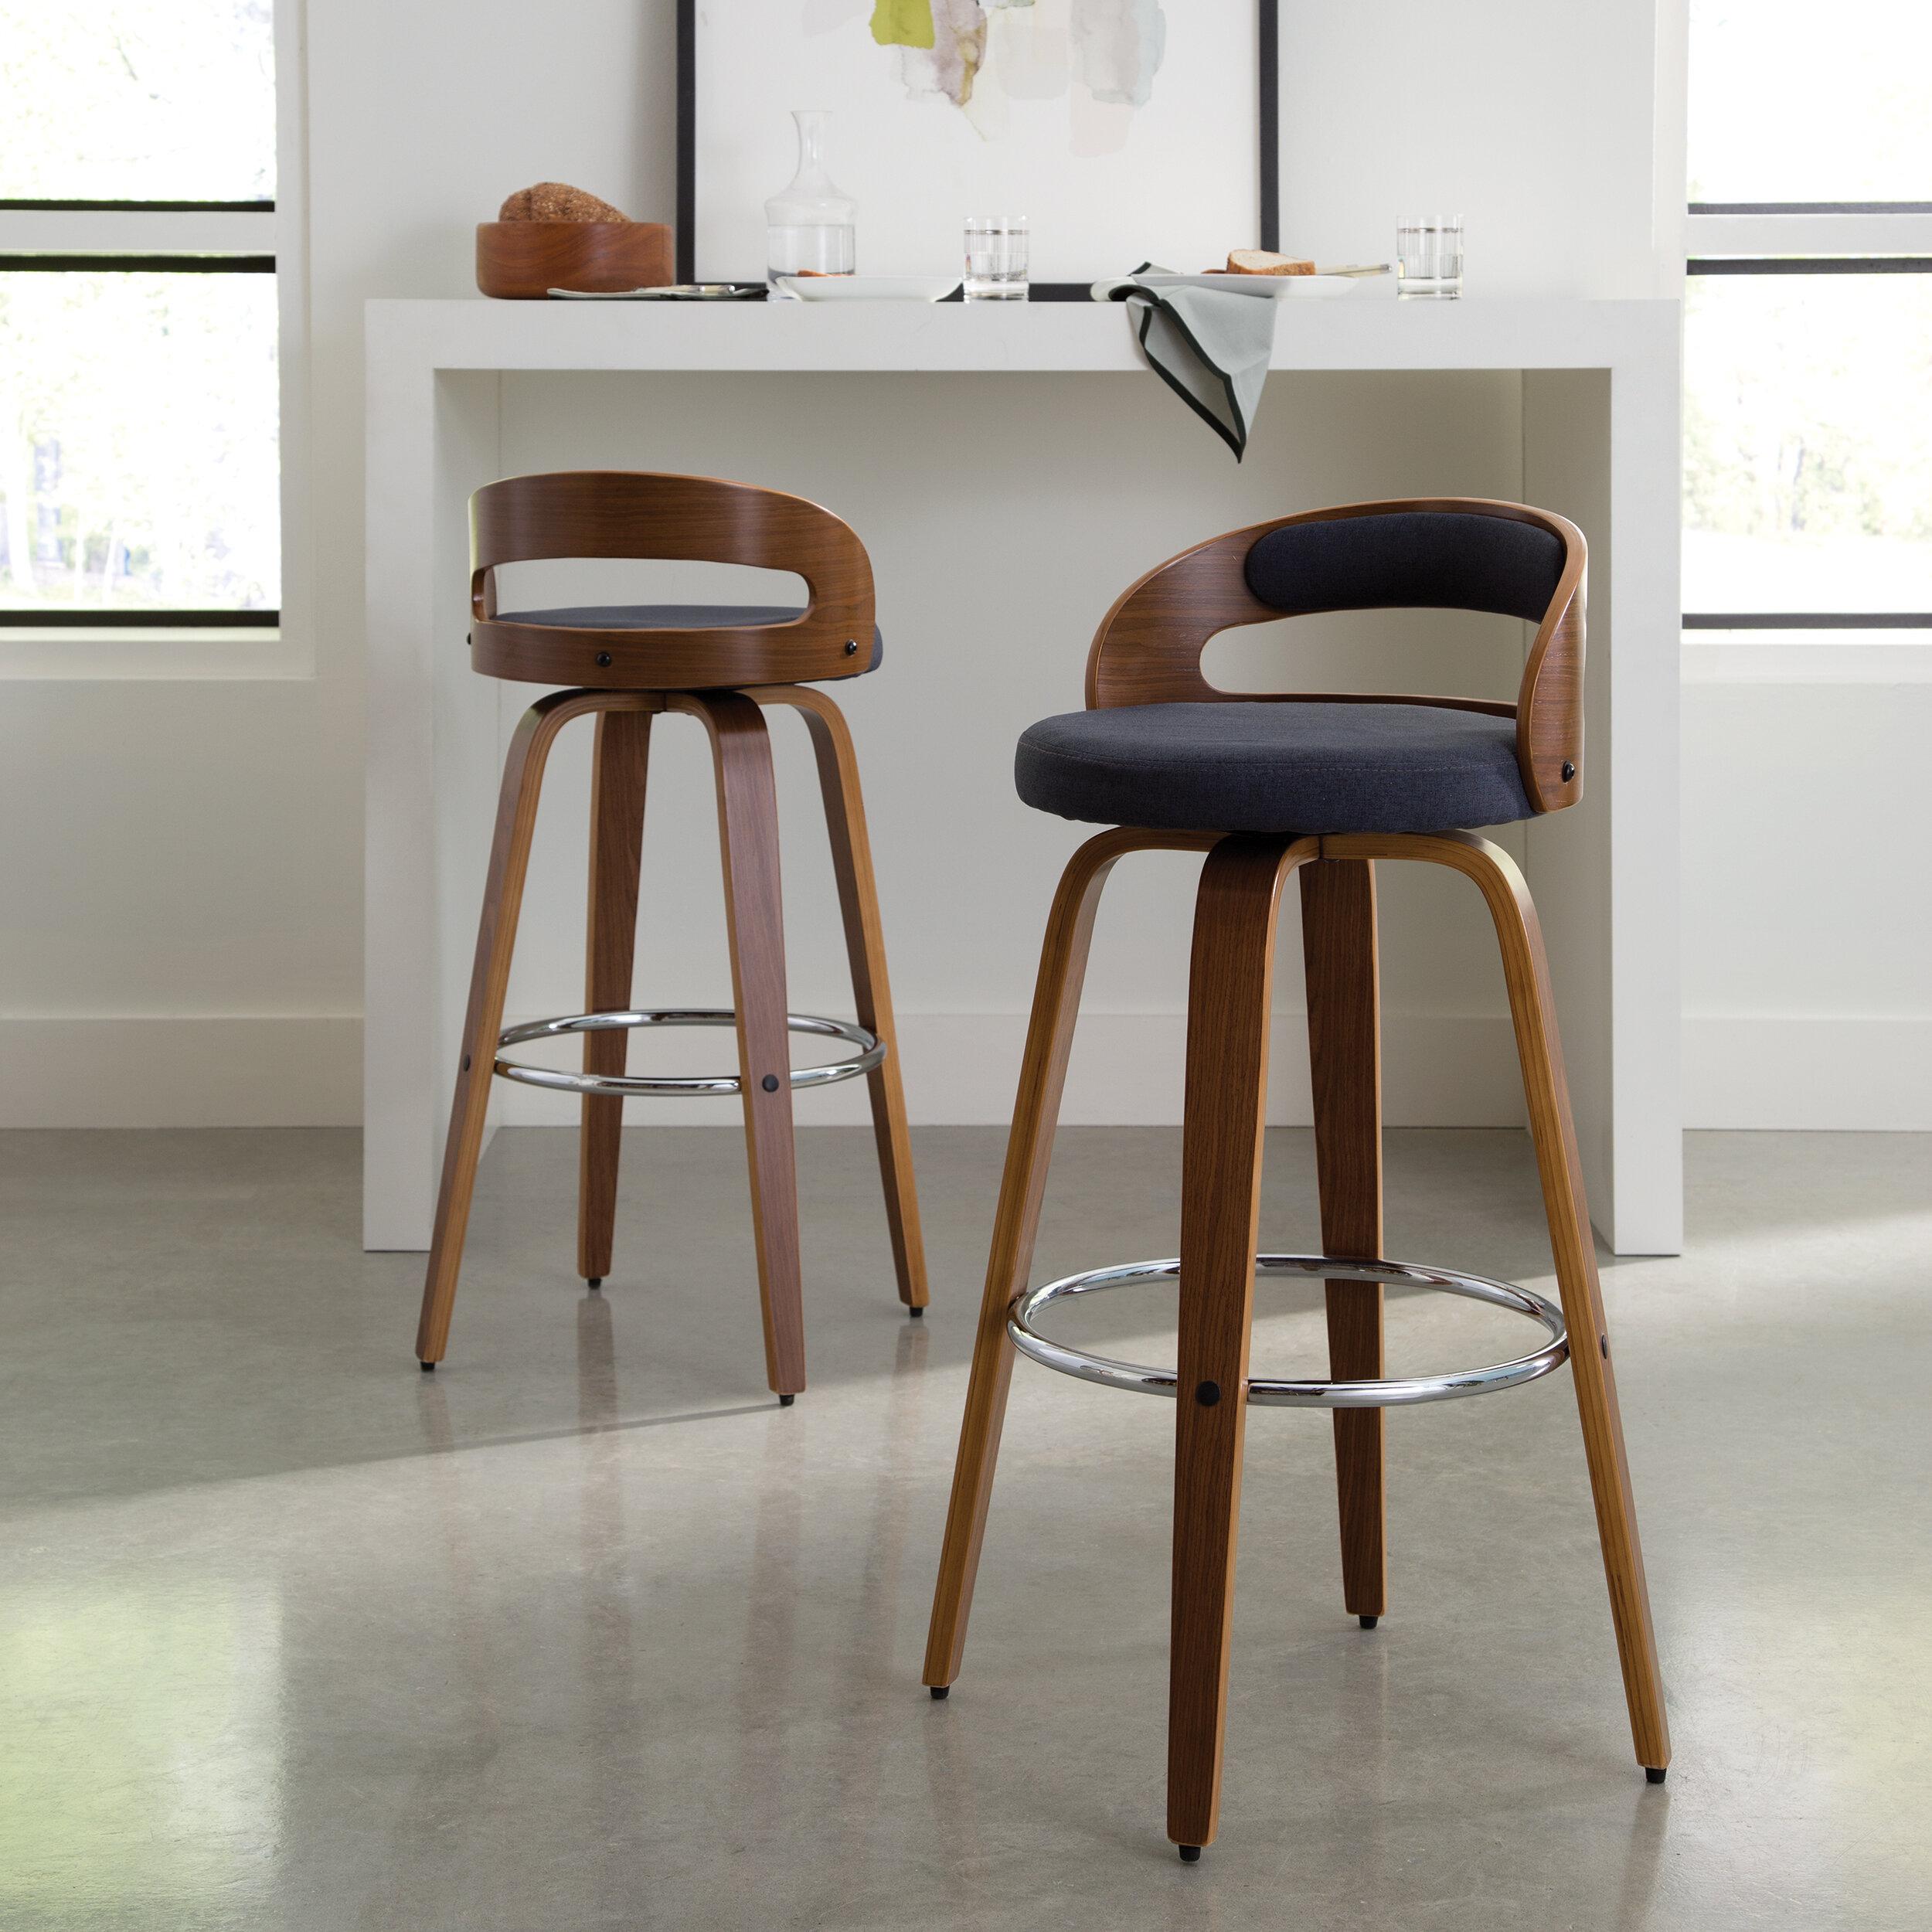 Cool Lachance Mid Century Modern Low Back Bentwood Frame 30 Swivel Bar Stool Cjindustries Chair Design For Home Cjindustriesco